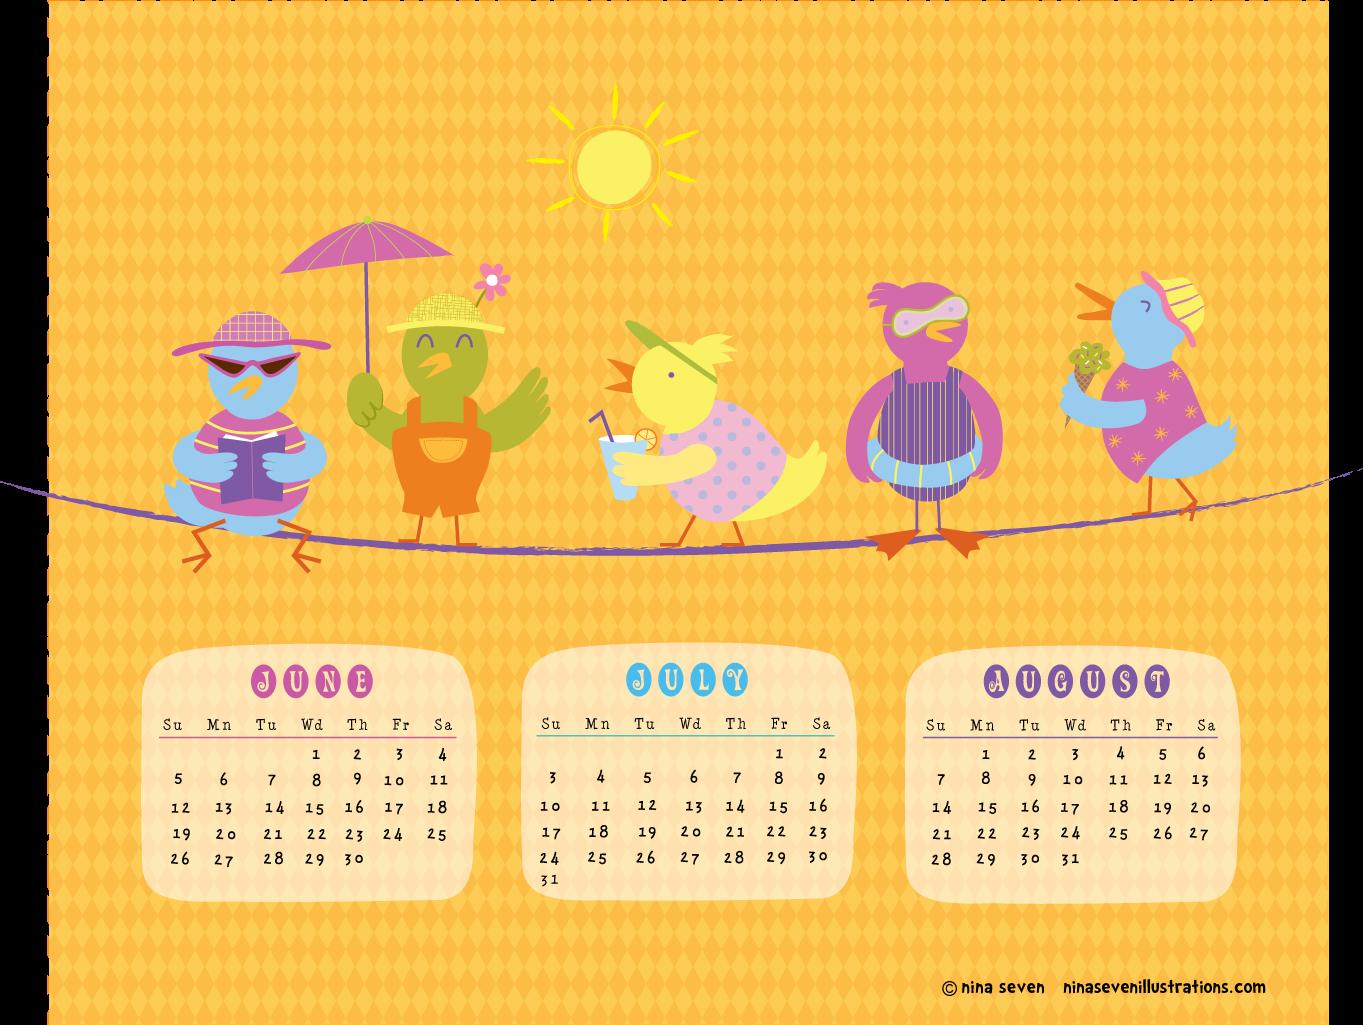 http://4.bp.blogspot.com/-M_Bc8znAvWA/Te0D9JB7-qI/AAAAAAAADhY/13HJFR2KWno/s1600/summer_+calendar.png